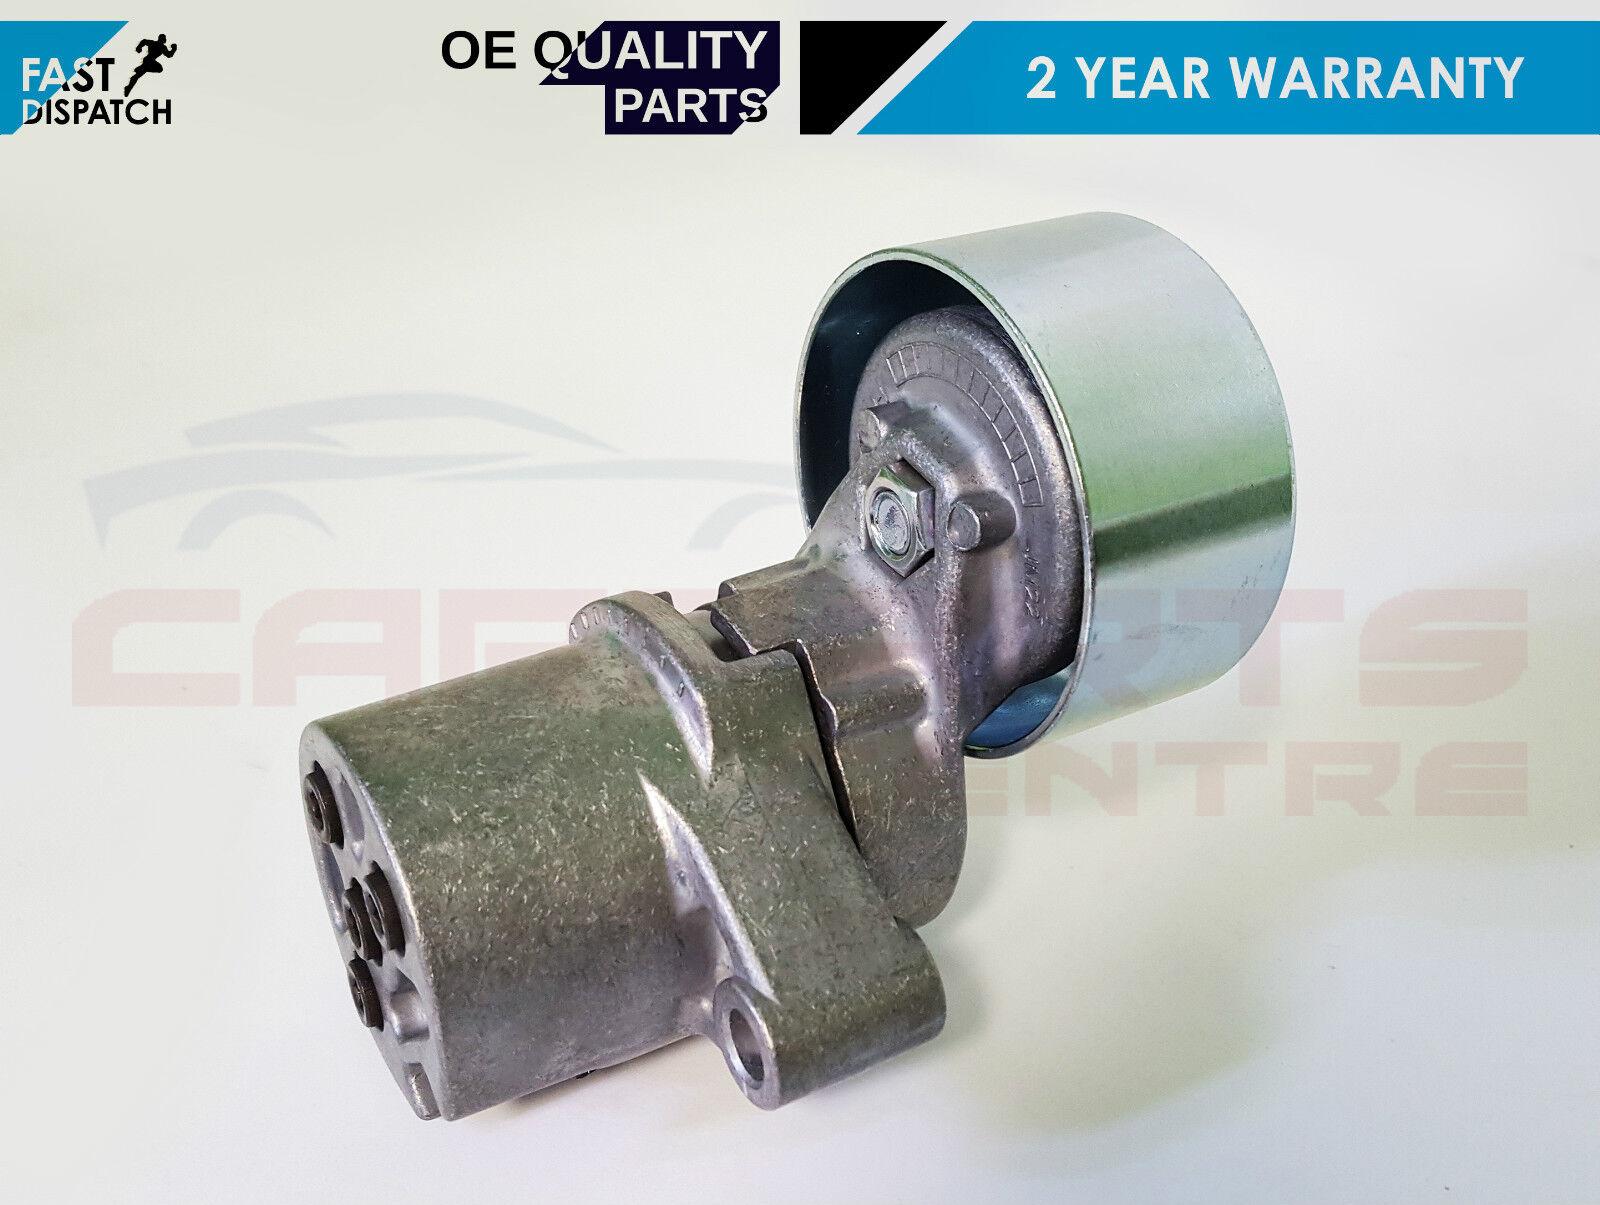 For Mazda 3 5 6 Mpv 20 Diesel Alternator Drive Fan Belt Tensioner 2002 626 Pulley